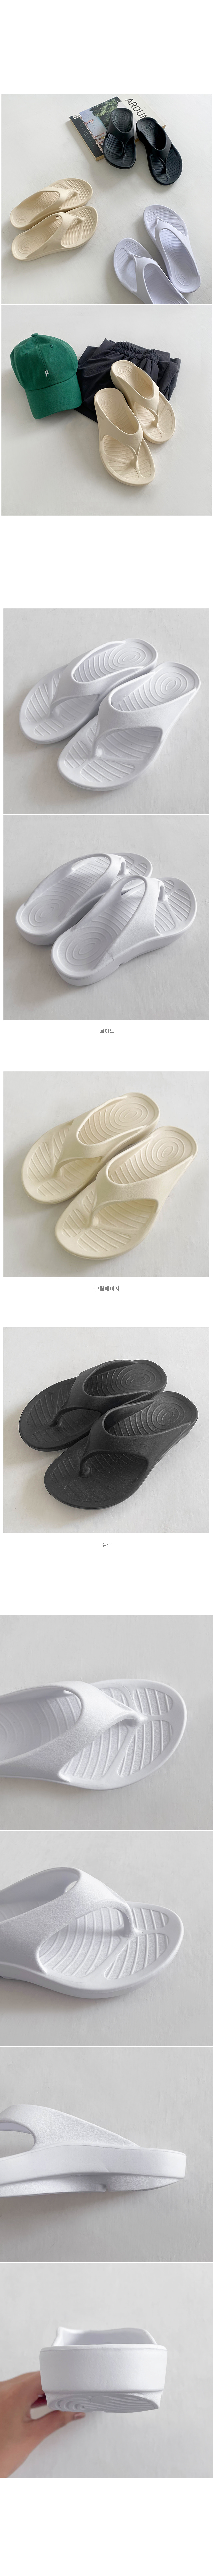 Rest Cushion Flip Flops